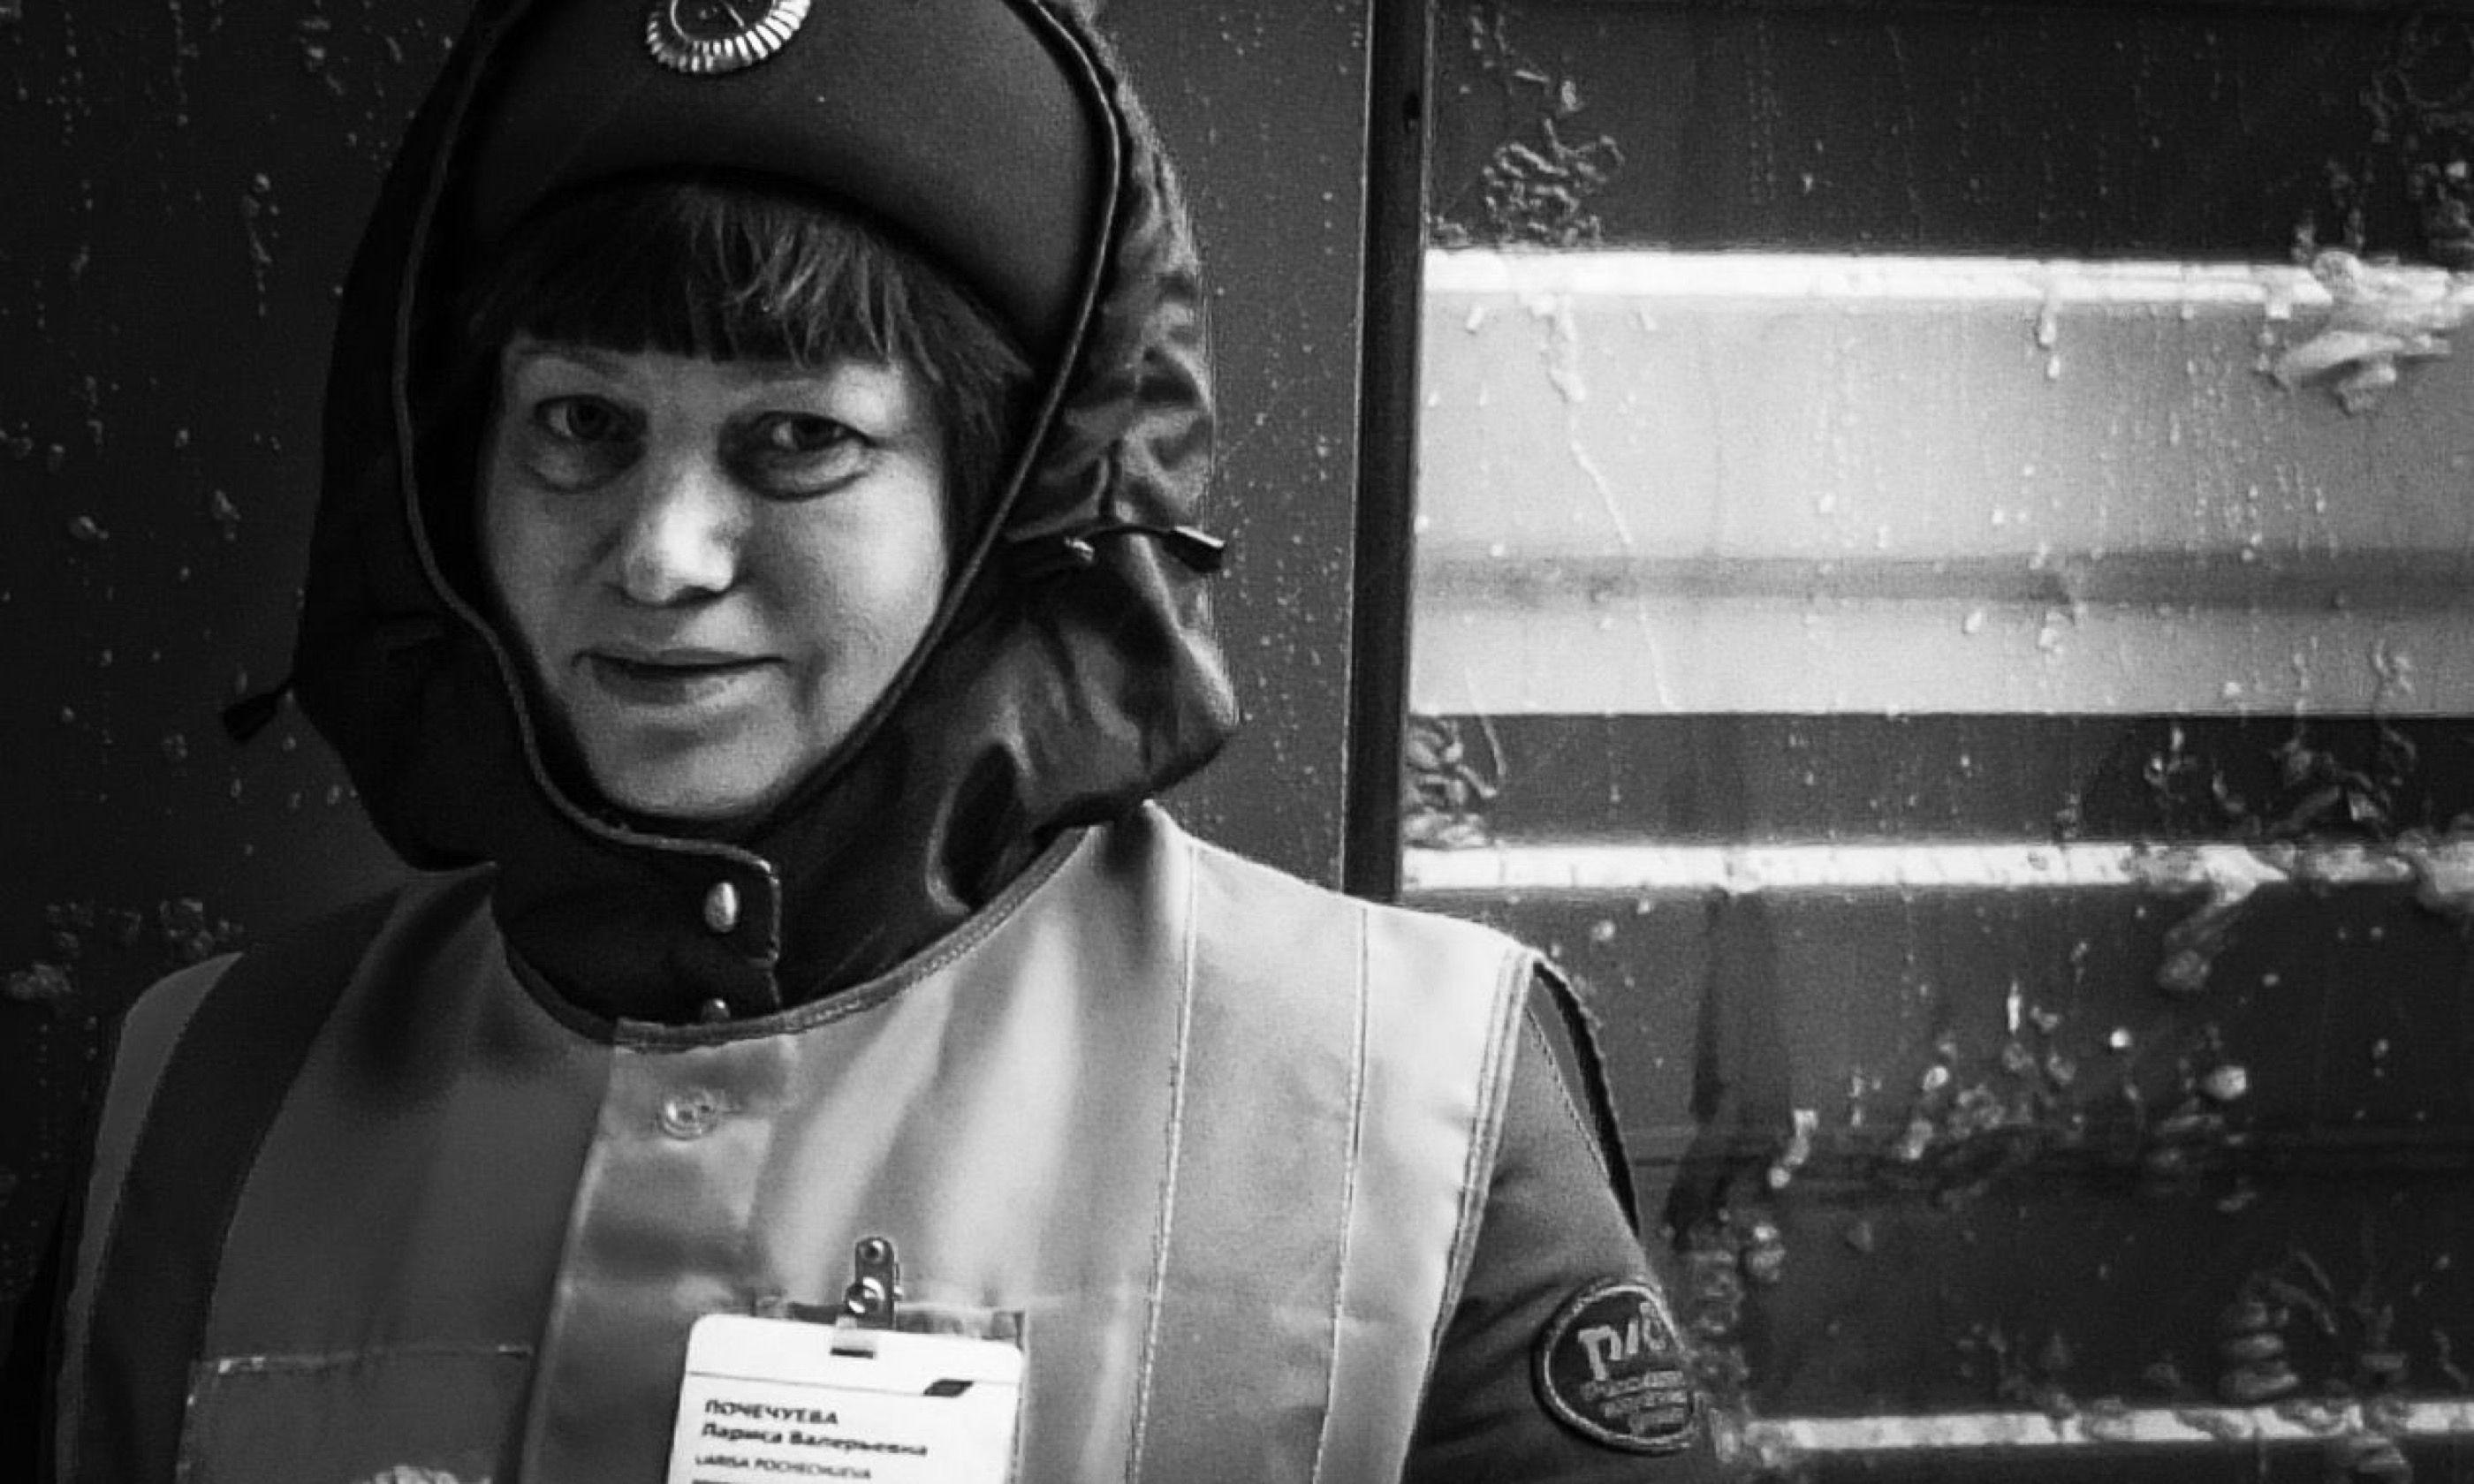 Train guard on the Trans Siberian (Matthew Woodward)